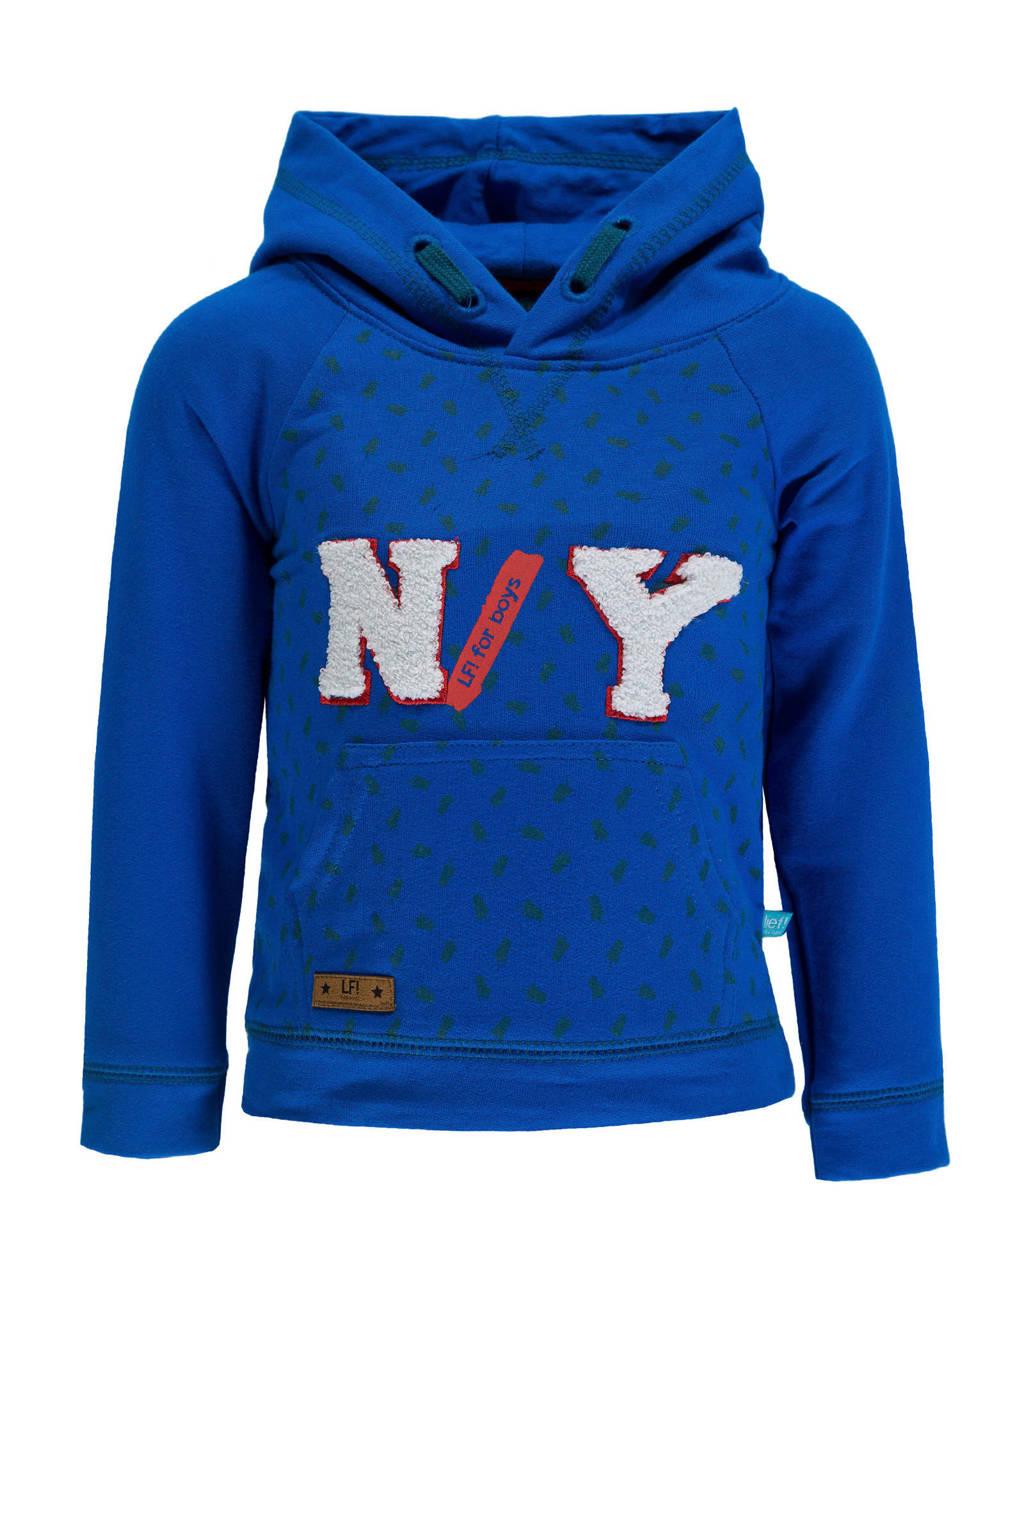 lief! hoodie met tekst blauw, Blauw